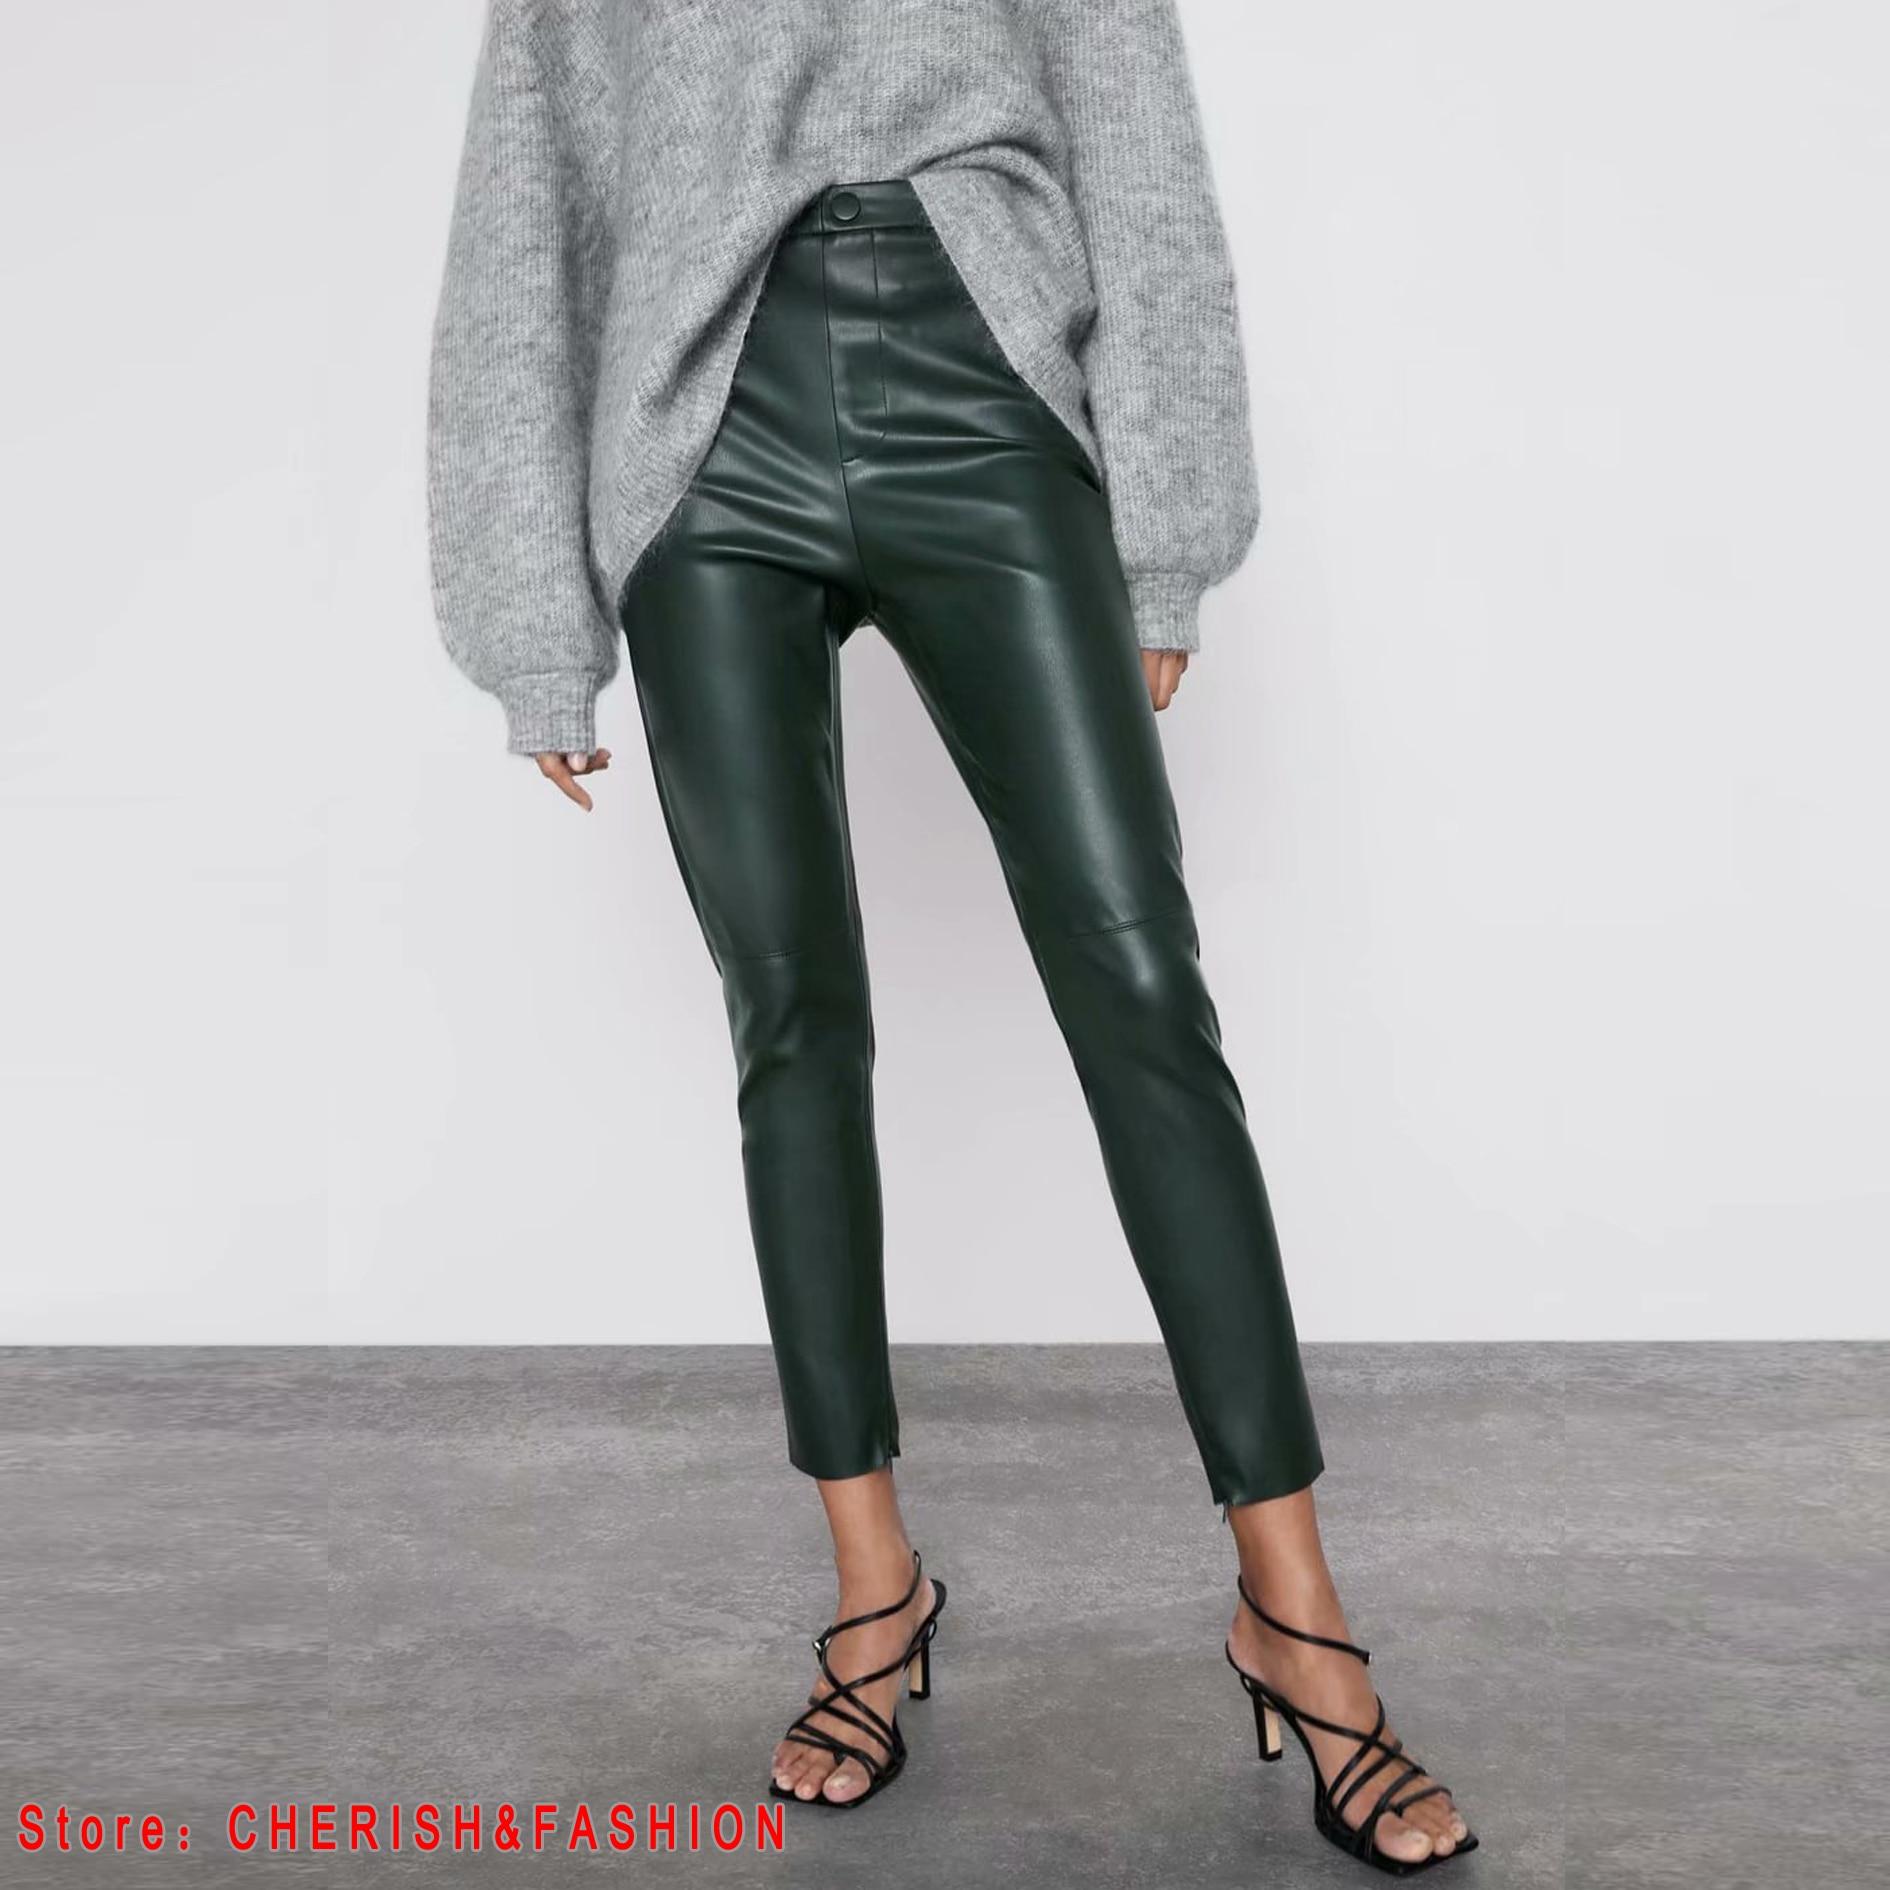 2020 New Fashion Autumn Winter Women High Waist Black Faux Leather Pants Lady PU Loose Pencil Trousers Elegant Pocket Streetwear